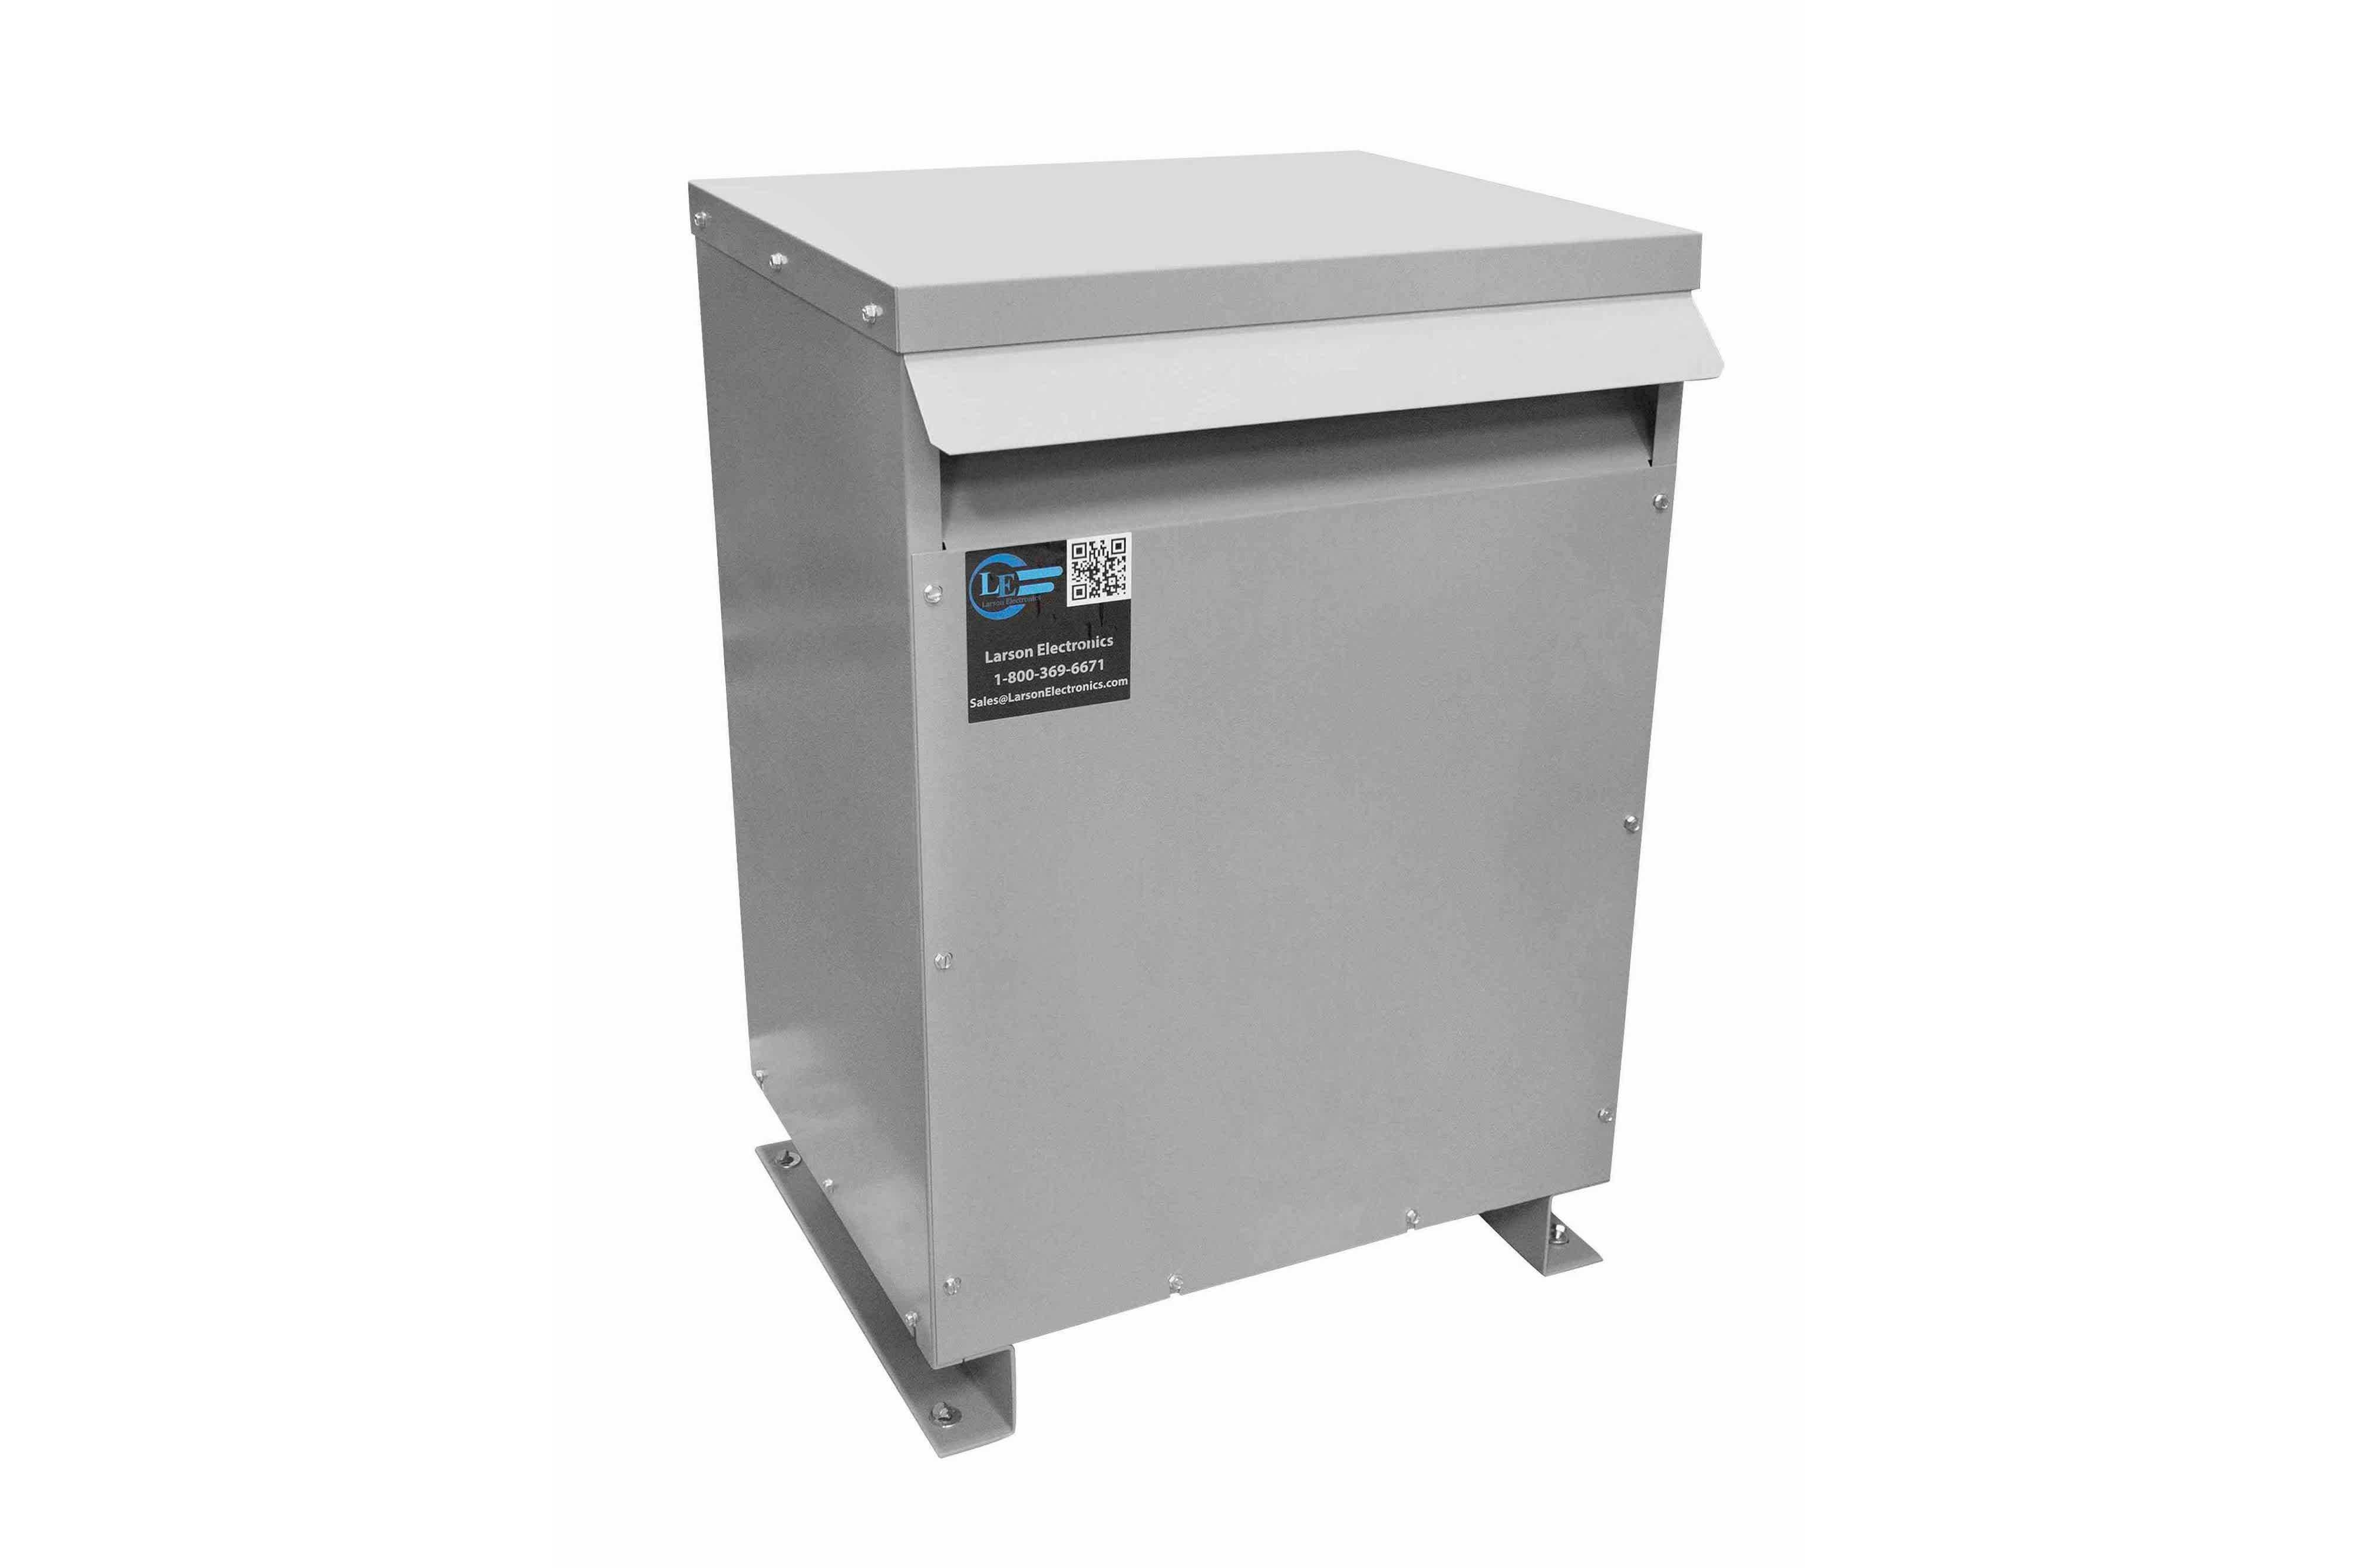 275 kVA 3PH Isolation Transformer, 400V Wye Primary, 240V/120 Delta Secondary, N3R, Ventilated, 60 Hz